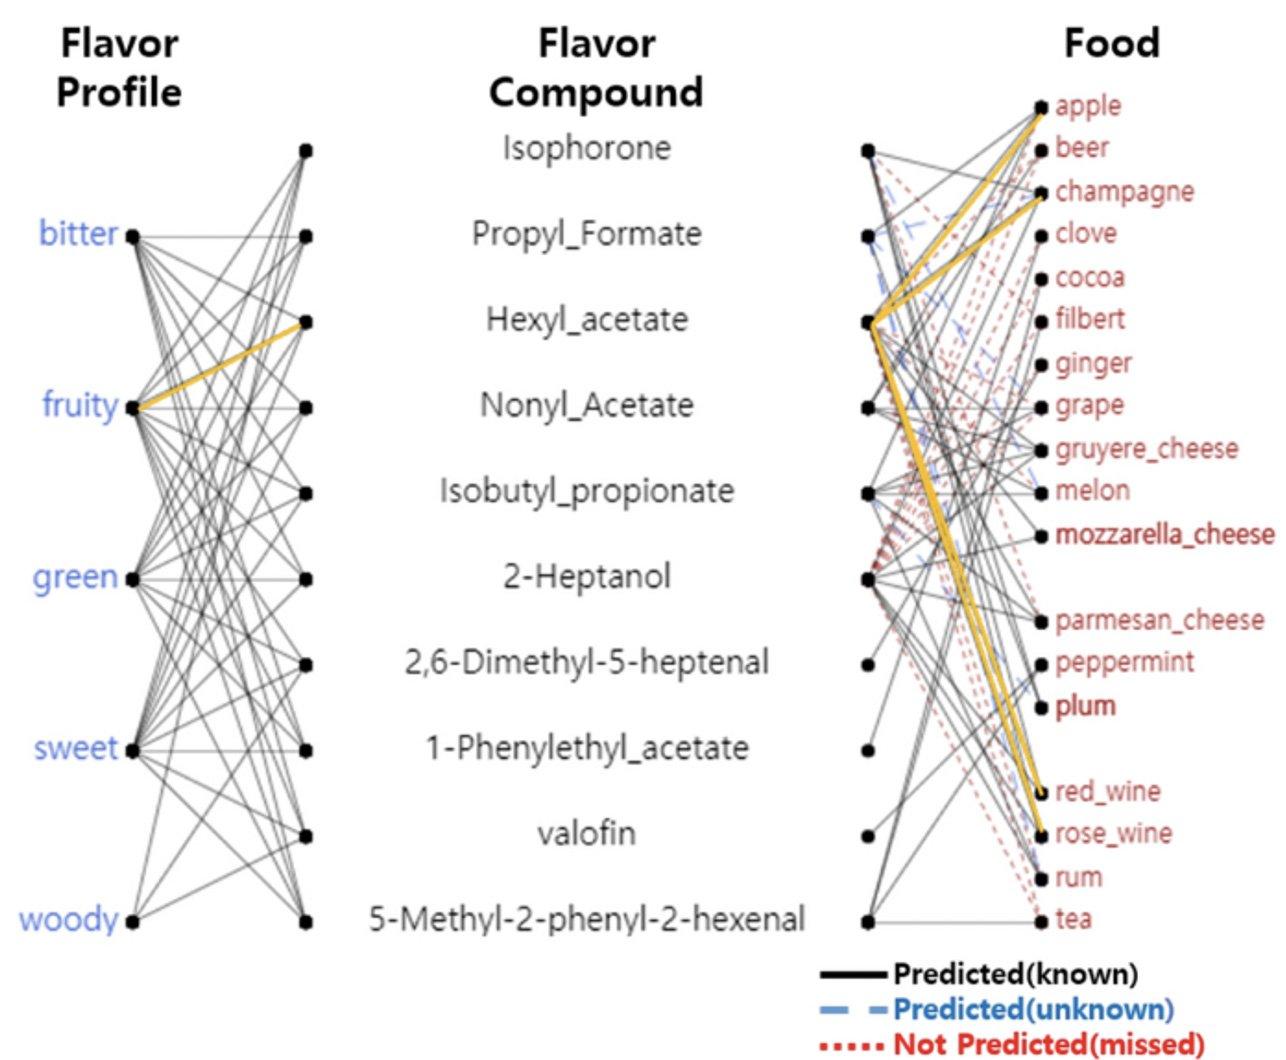 هوش مصنوعی FlavorGraph